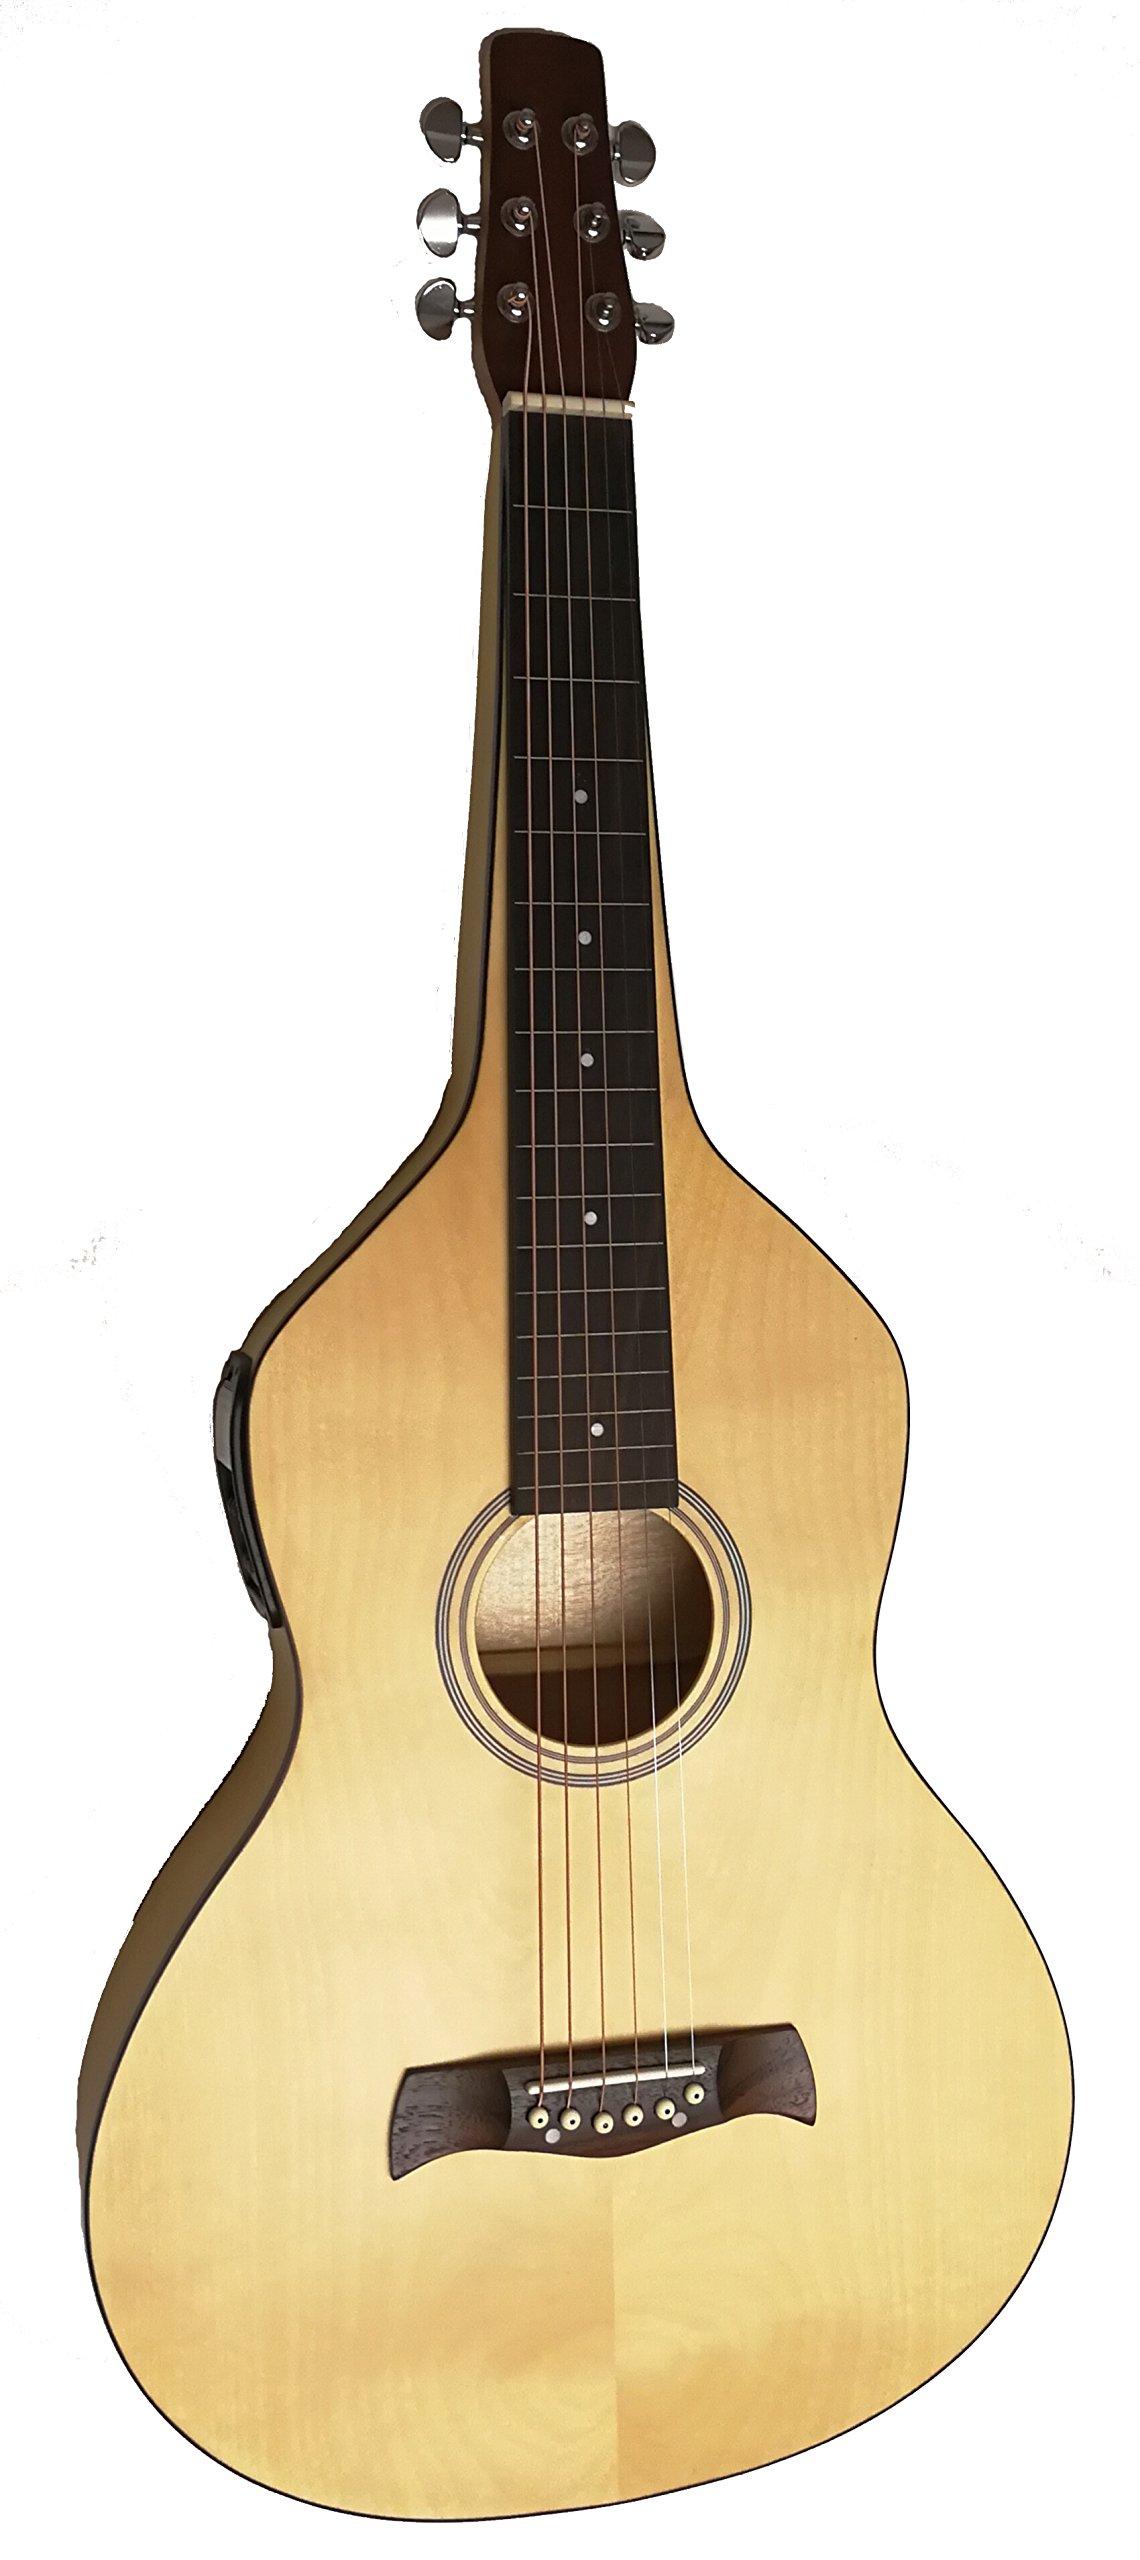 Cheap All Maple Weissenborn Style Electric Lap Steel Hawaiian Guitar Black Friday & Cyber Monday 2019